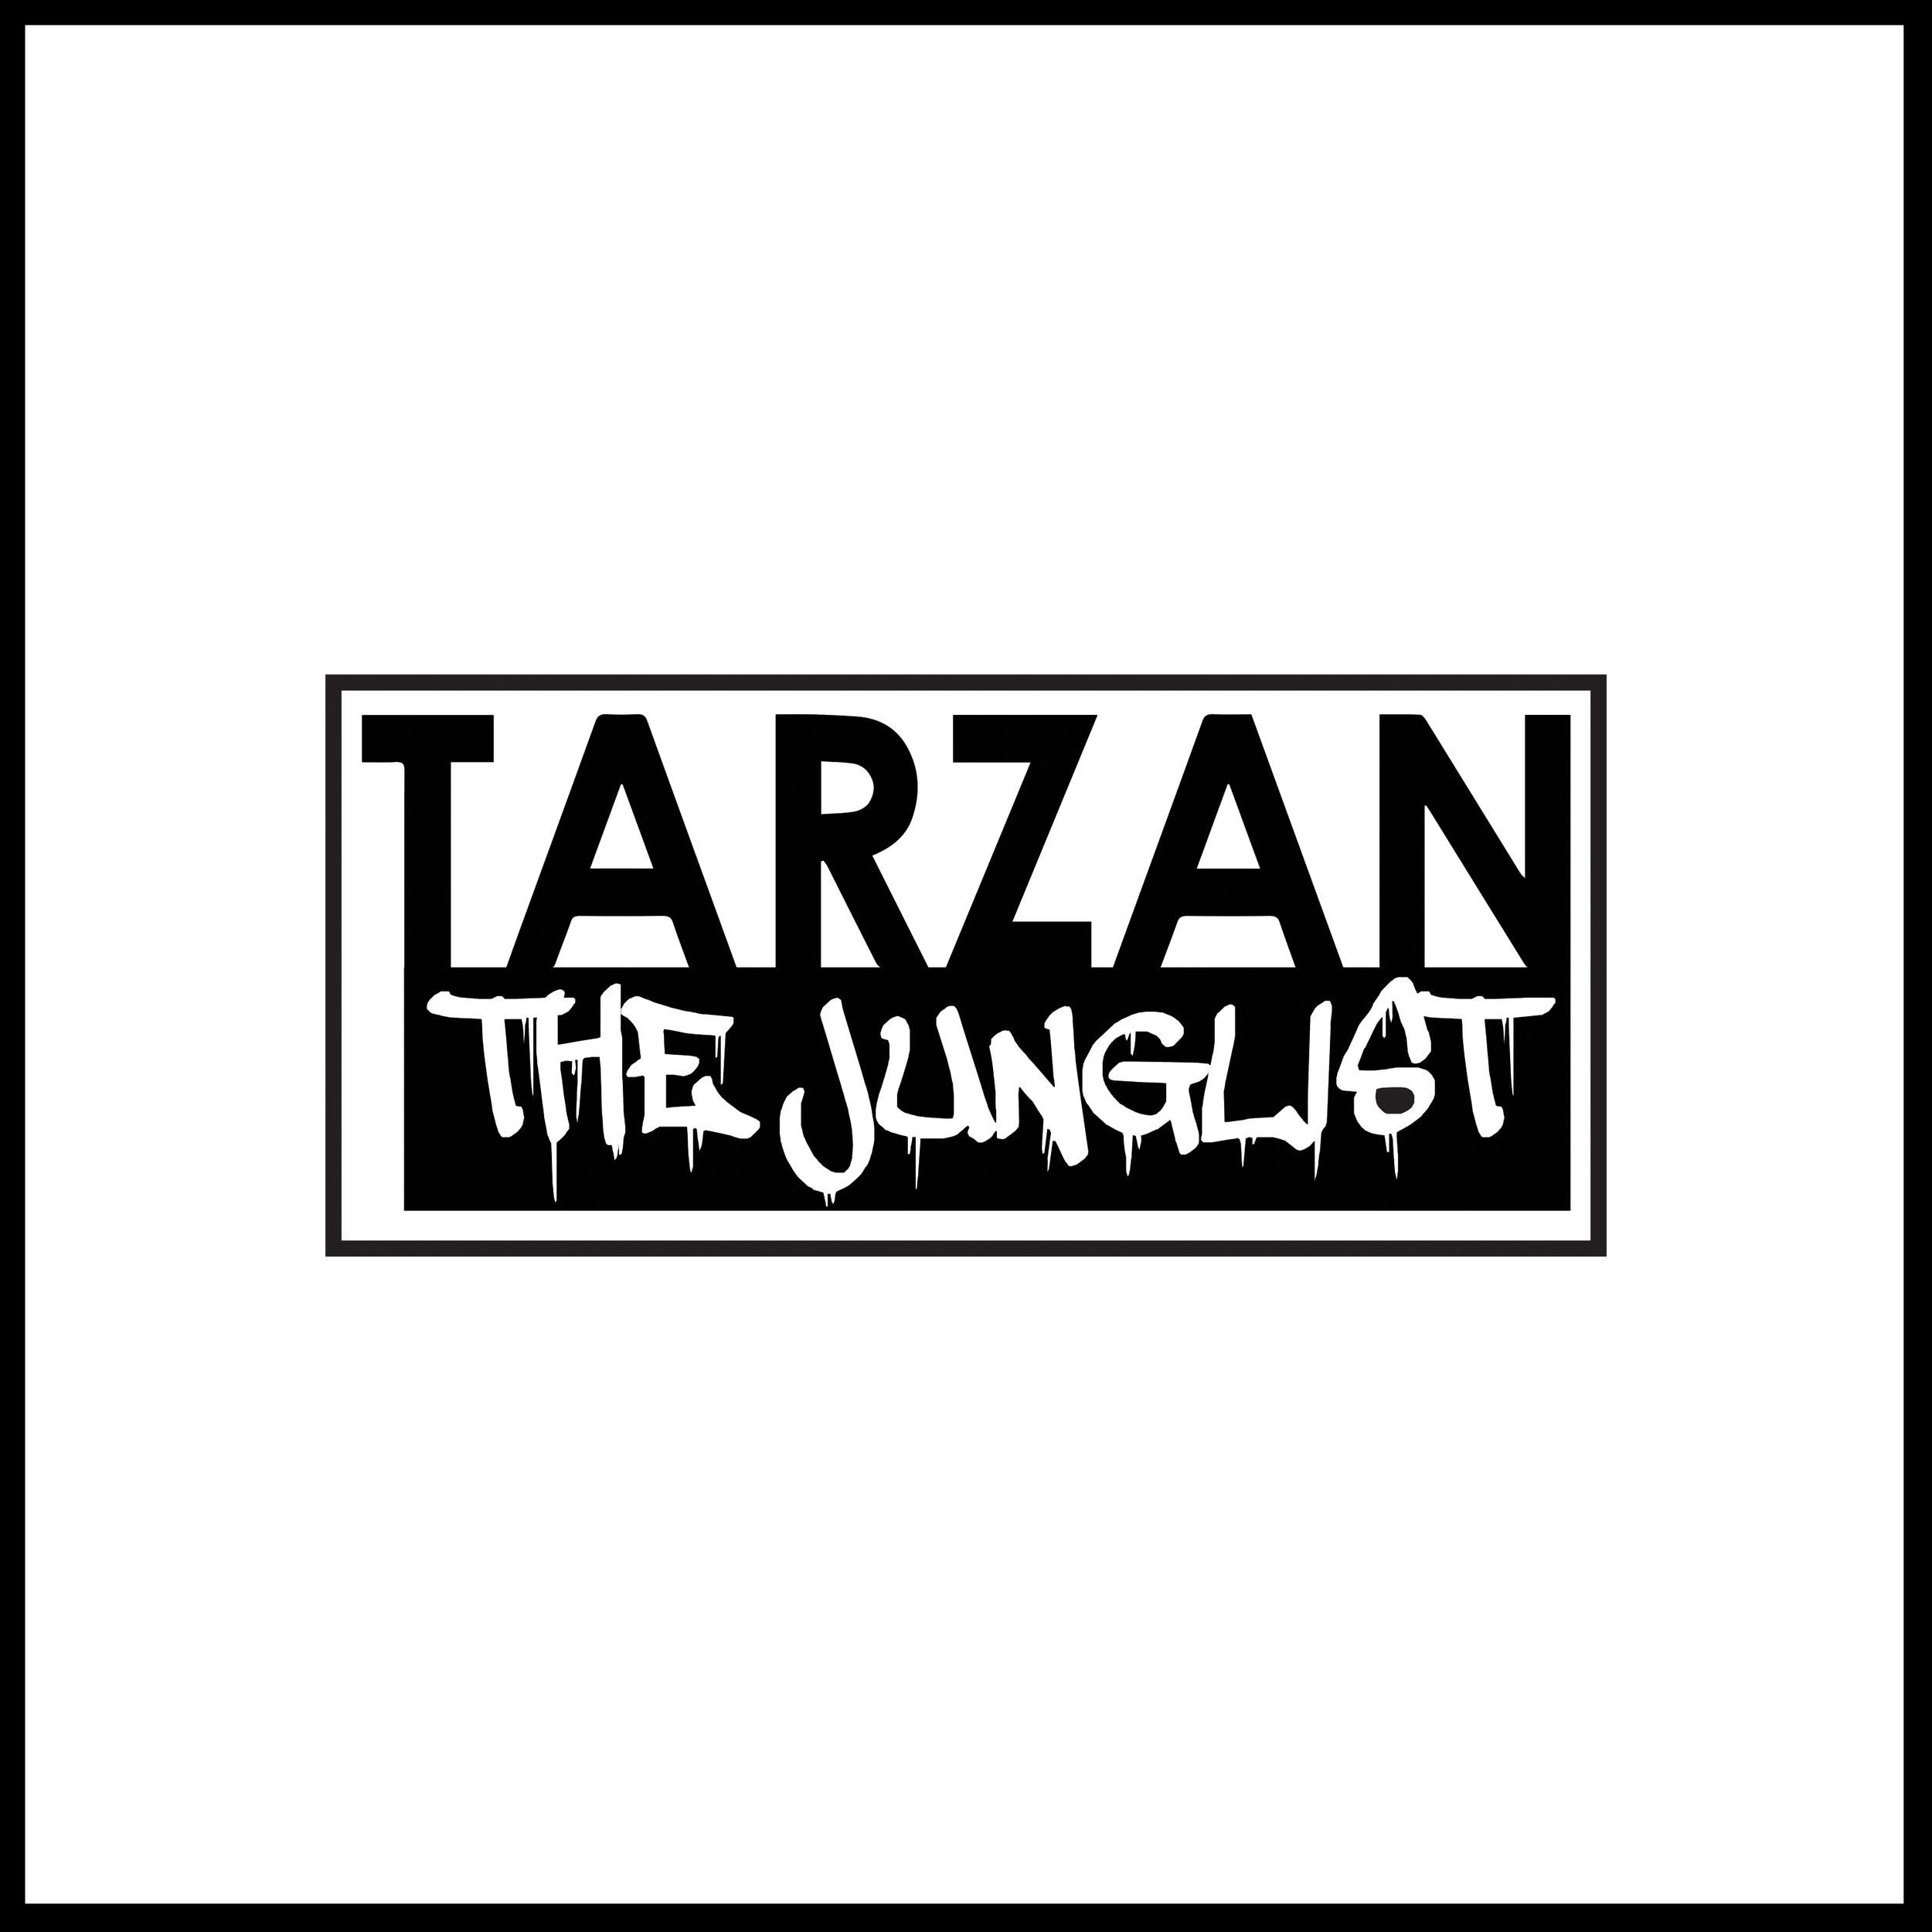 [OFDM024] Tarzan The Junglist - He Is No Normal Man.jpg